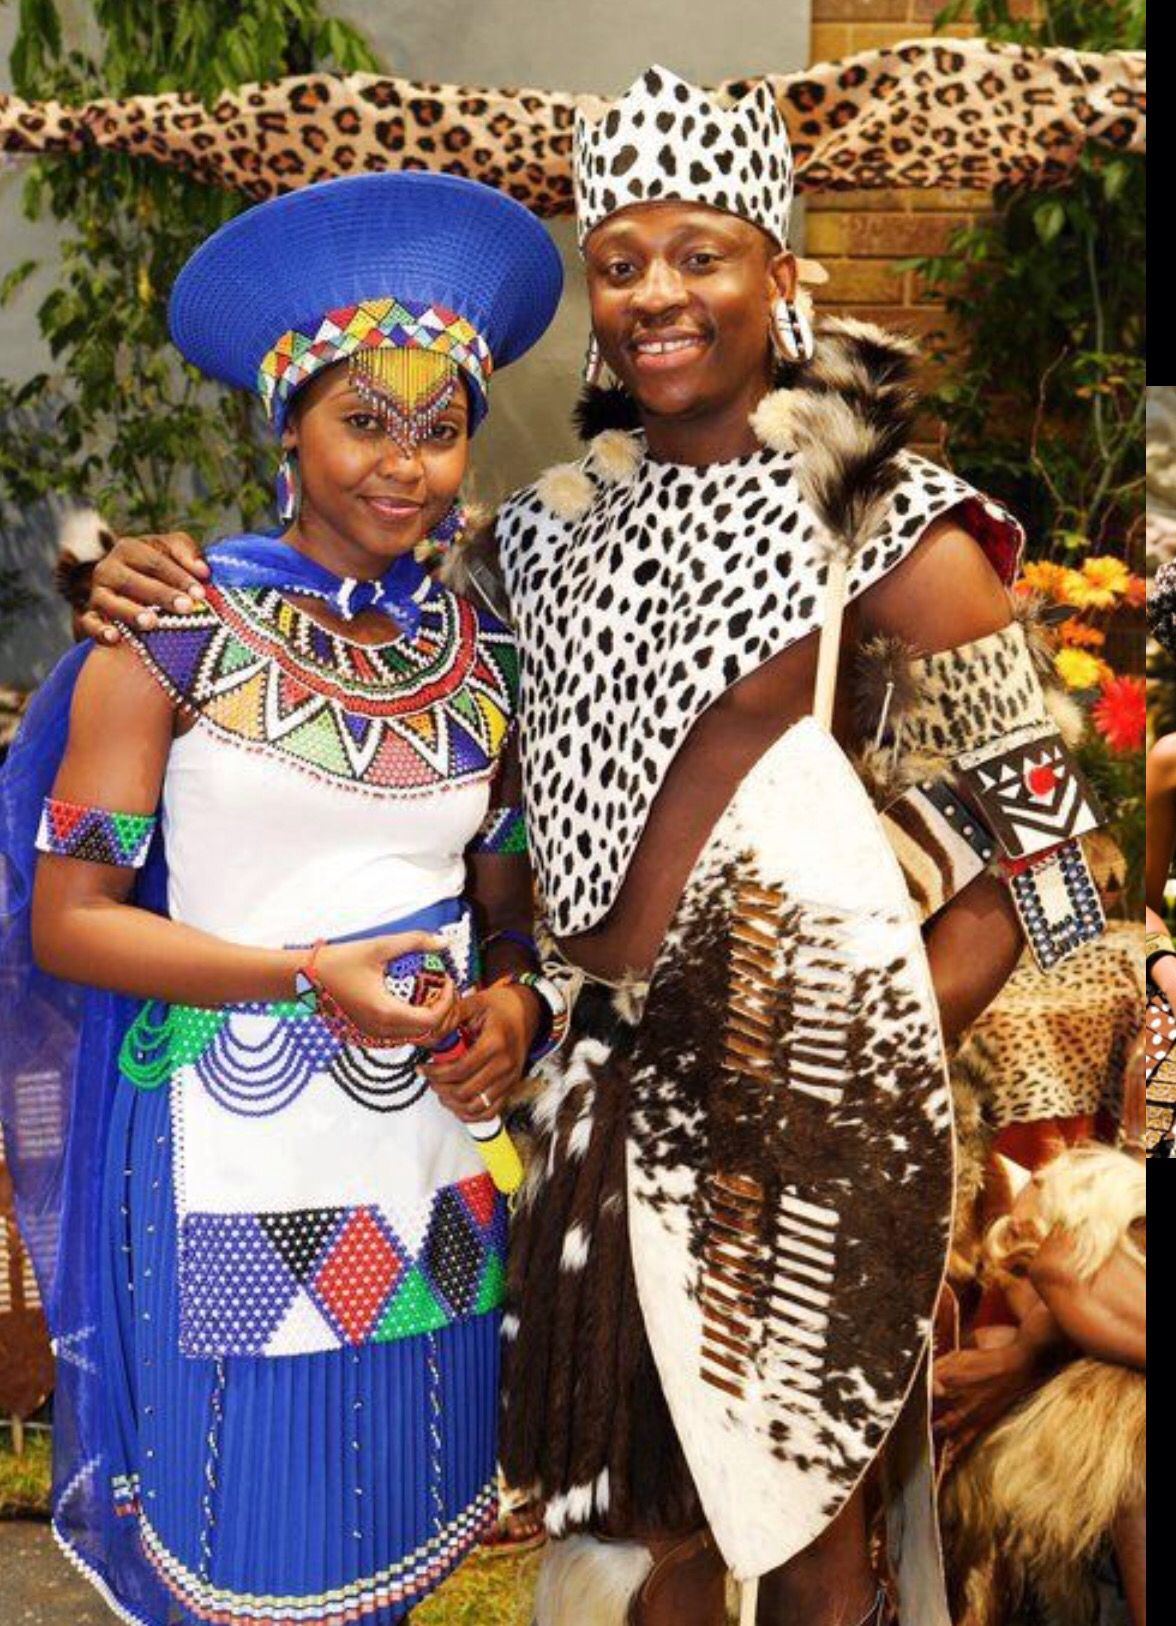 Modern Zulu Bride And Groom. African traditional wedding